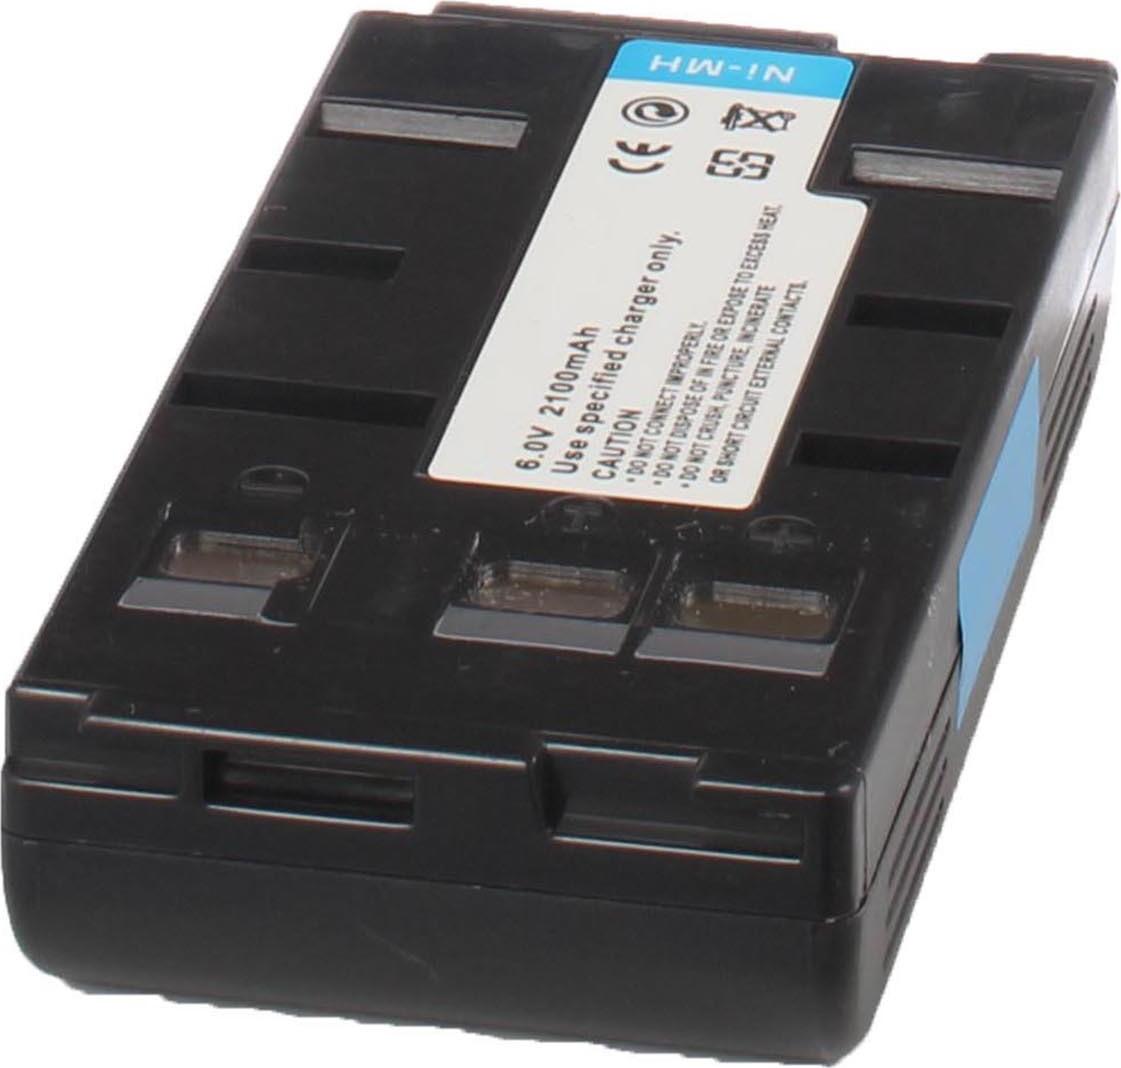 Аккумуляторная батарея iBatt iB-T3-F177 2100mAh для камер Panasonic NV-G120, NV-S250, NV-S800, NV-G101, NV-G220, NV-S600,  для Samsung VP-E405, VP-U12, VP-A30, VP-H65, VP-E807, VP-H66, VP-J52, VP-U10, VP-A50, VP-A55, VP-K75, VP-E808, VP-K85, VP-H68,